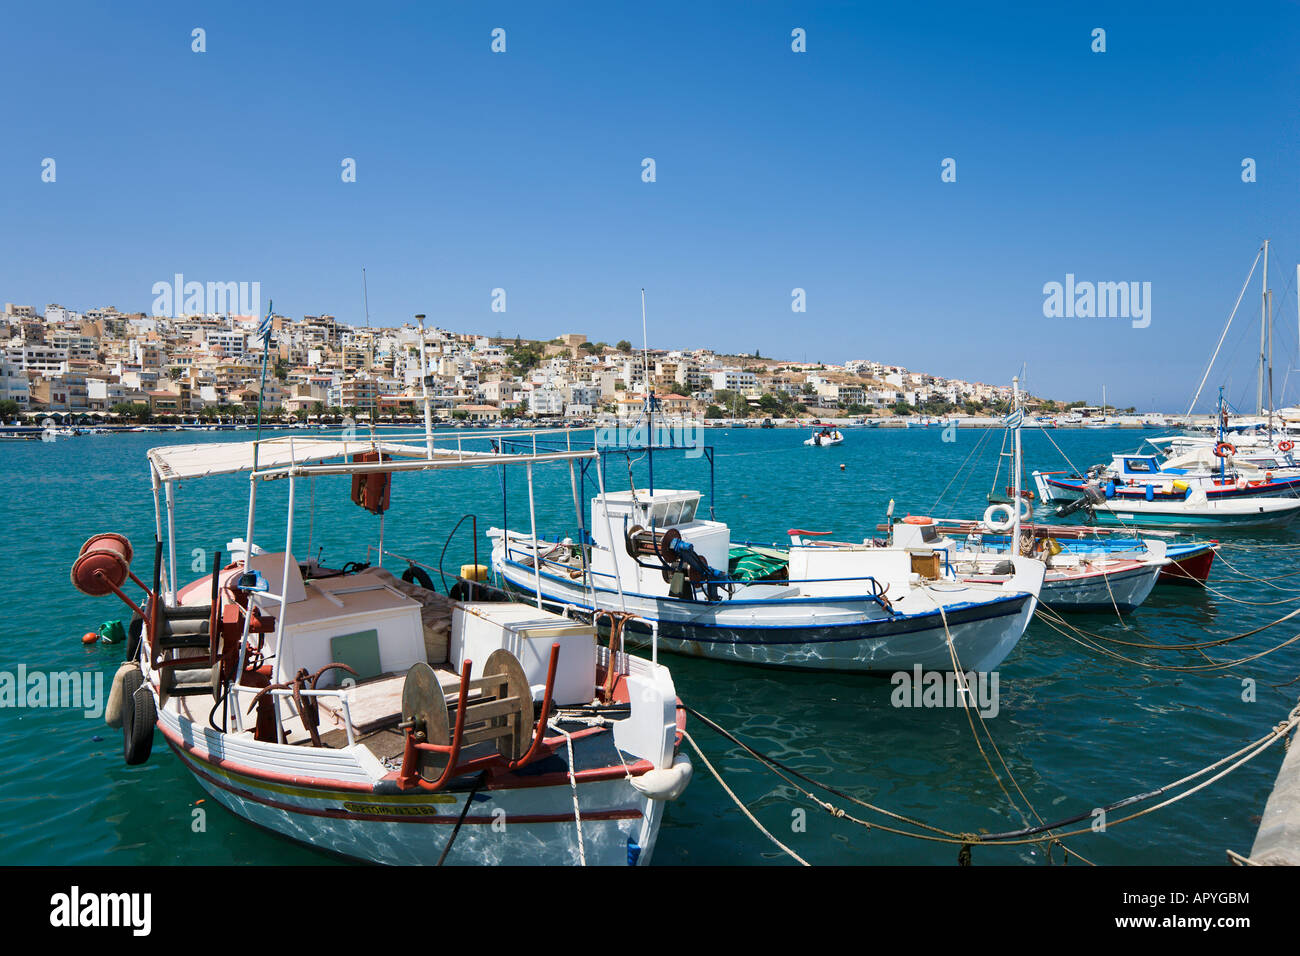 Harbour, Sitia, Lasithi Province, North East Coast, Crete, Greece - Stock Image